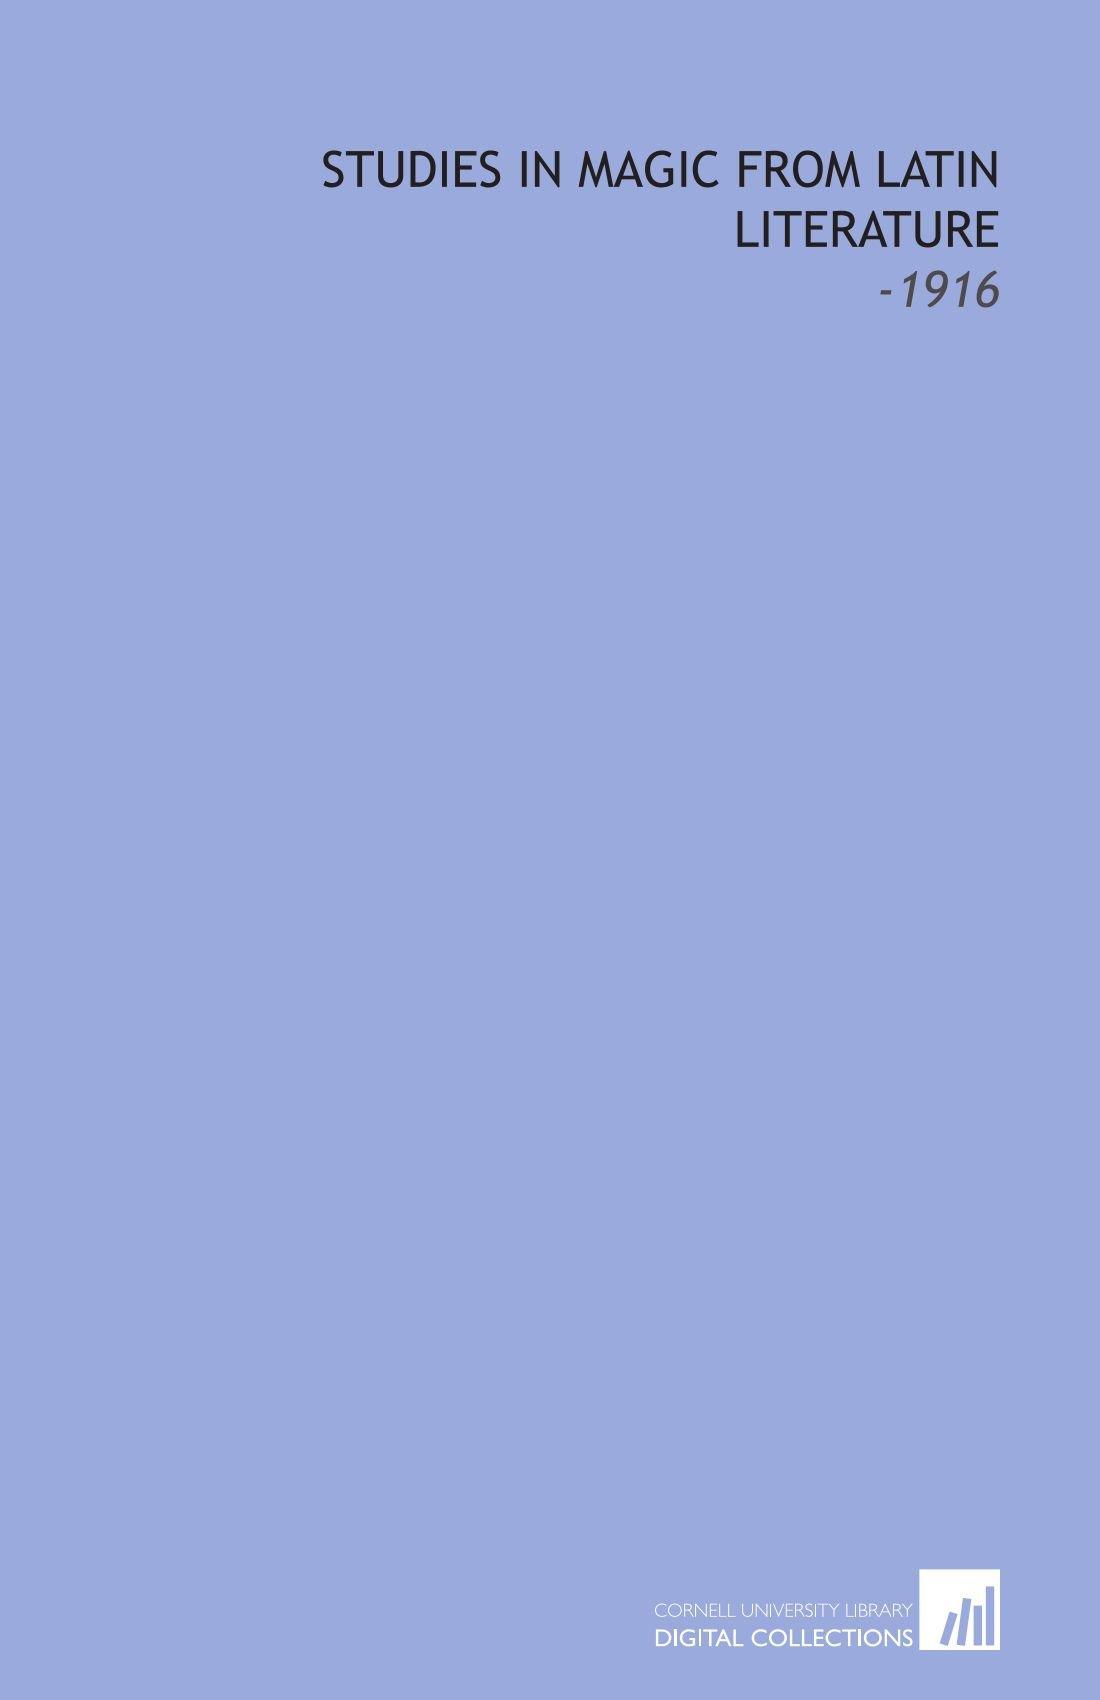 Studies in Magic From Latin Literature: -1916 pdf epub